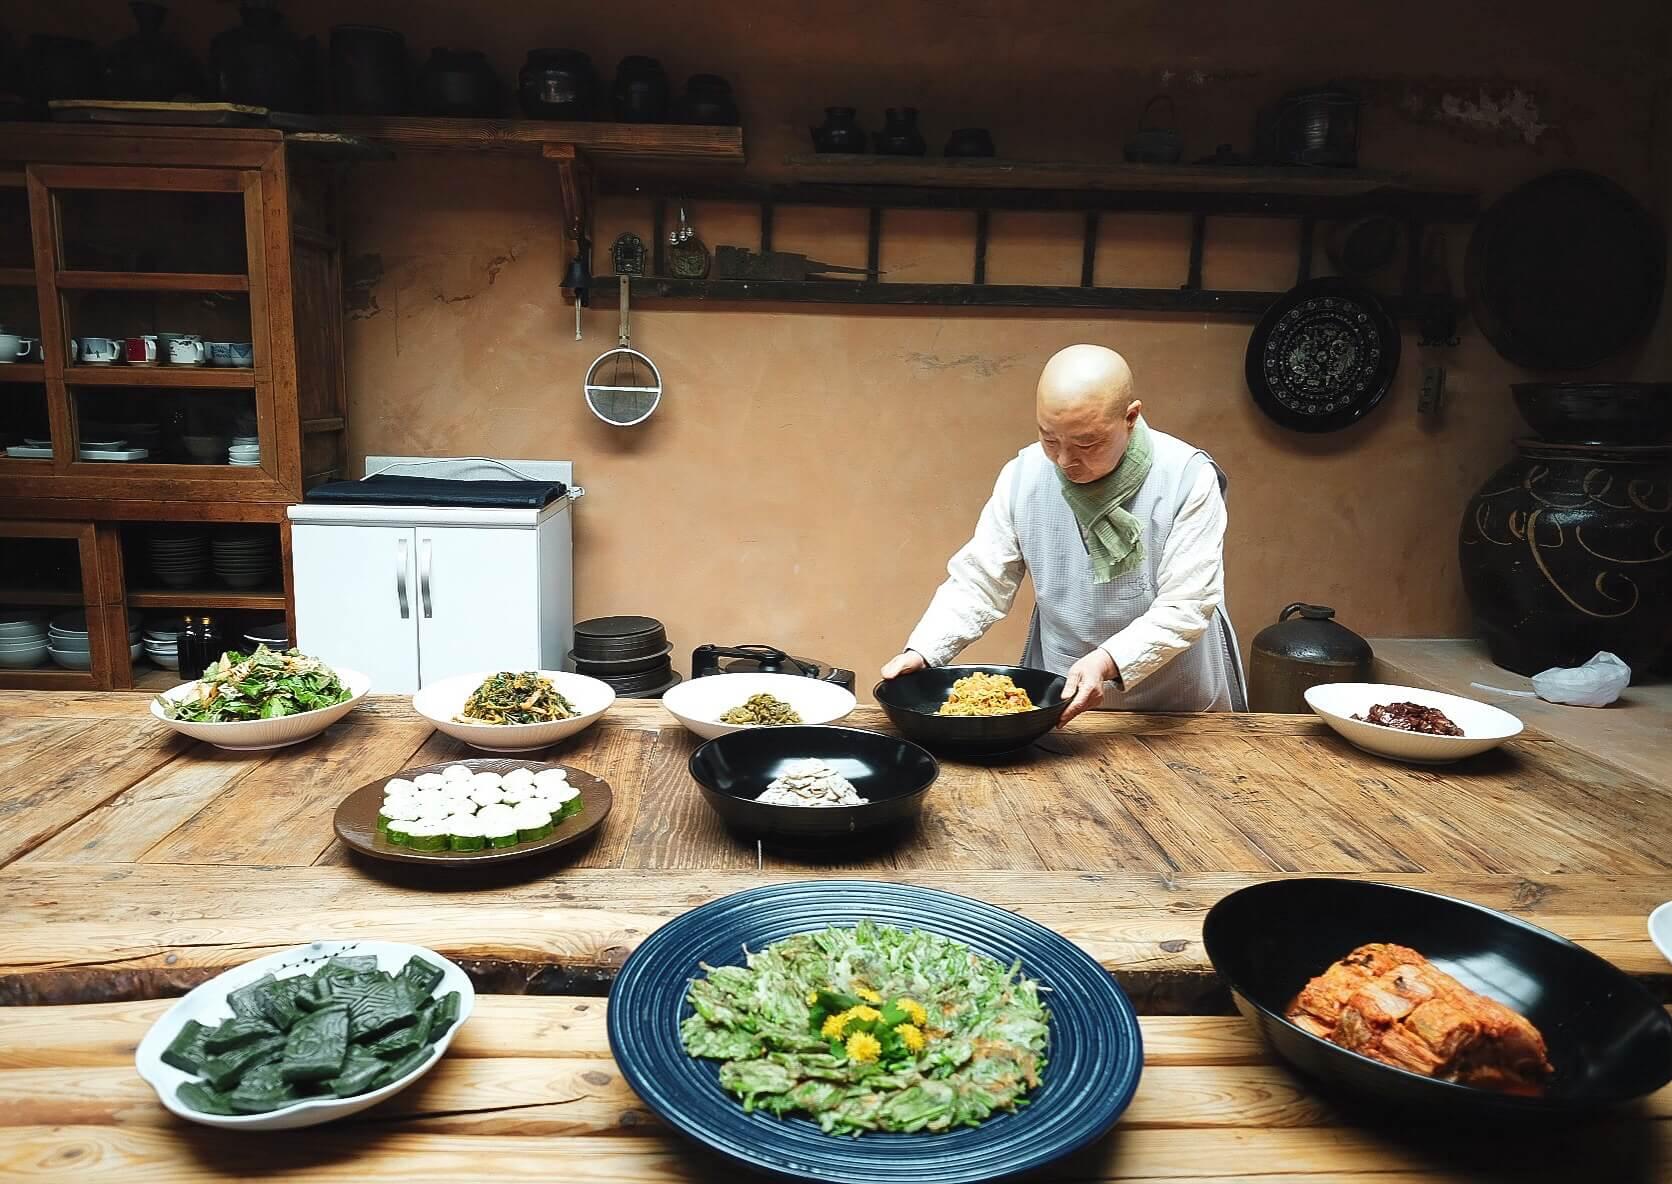 Chef Jeong Kwan preparing vegetarian food